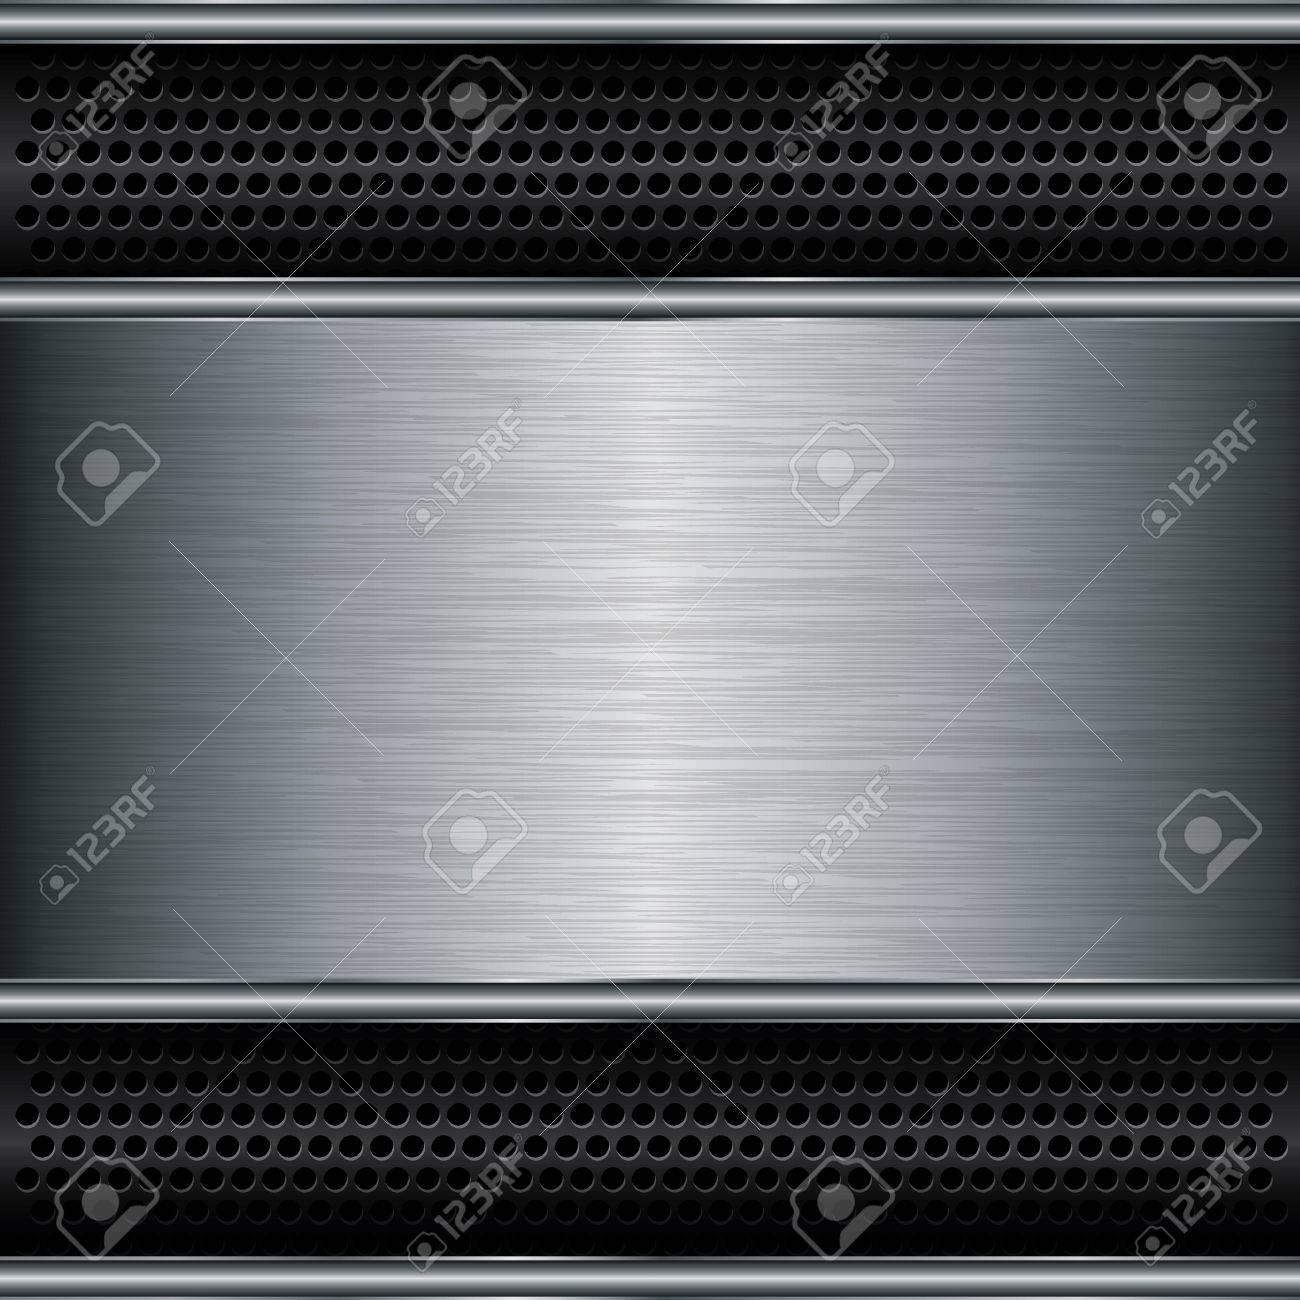 Abstract metallic background, vector illustration Stock Vector - 17020076